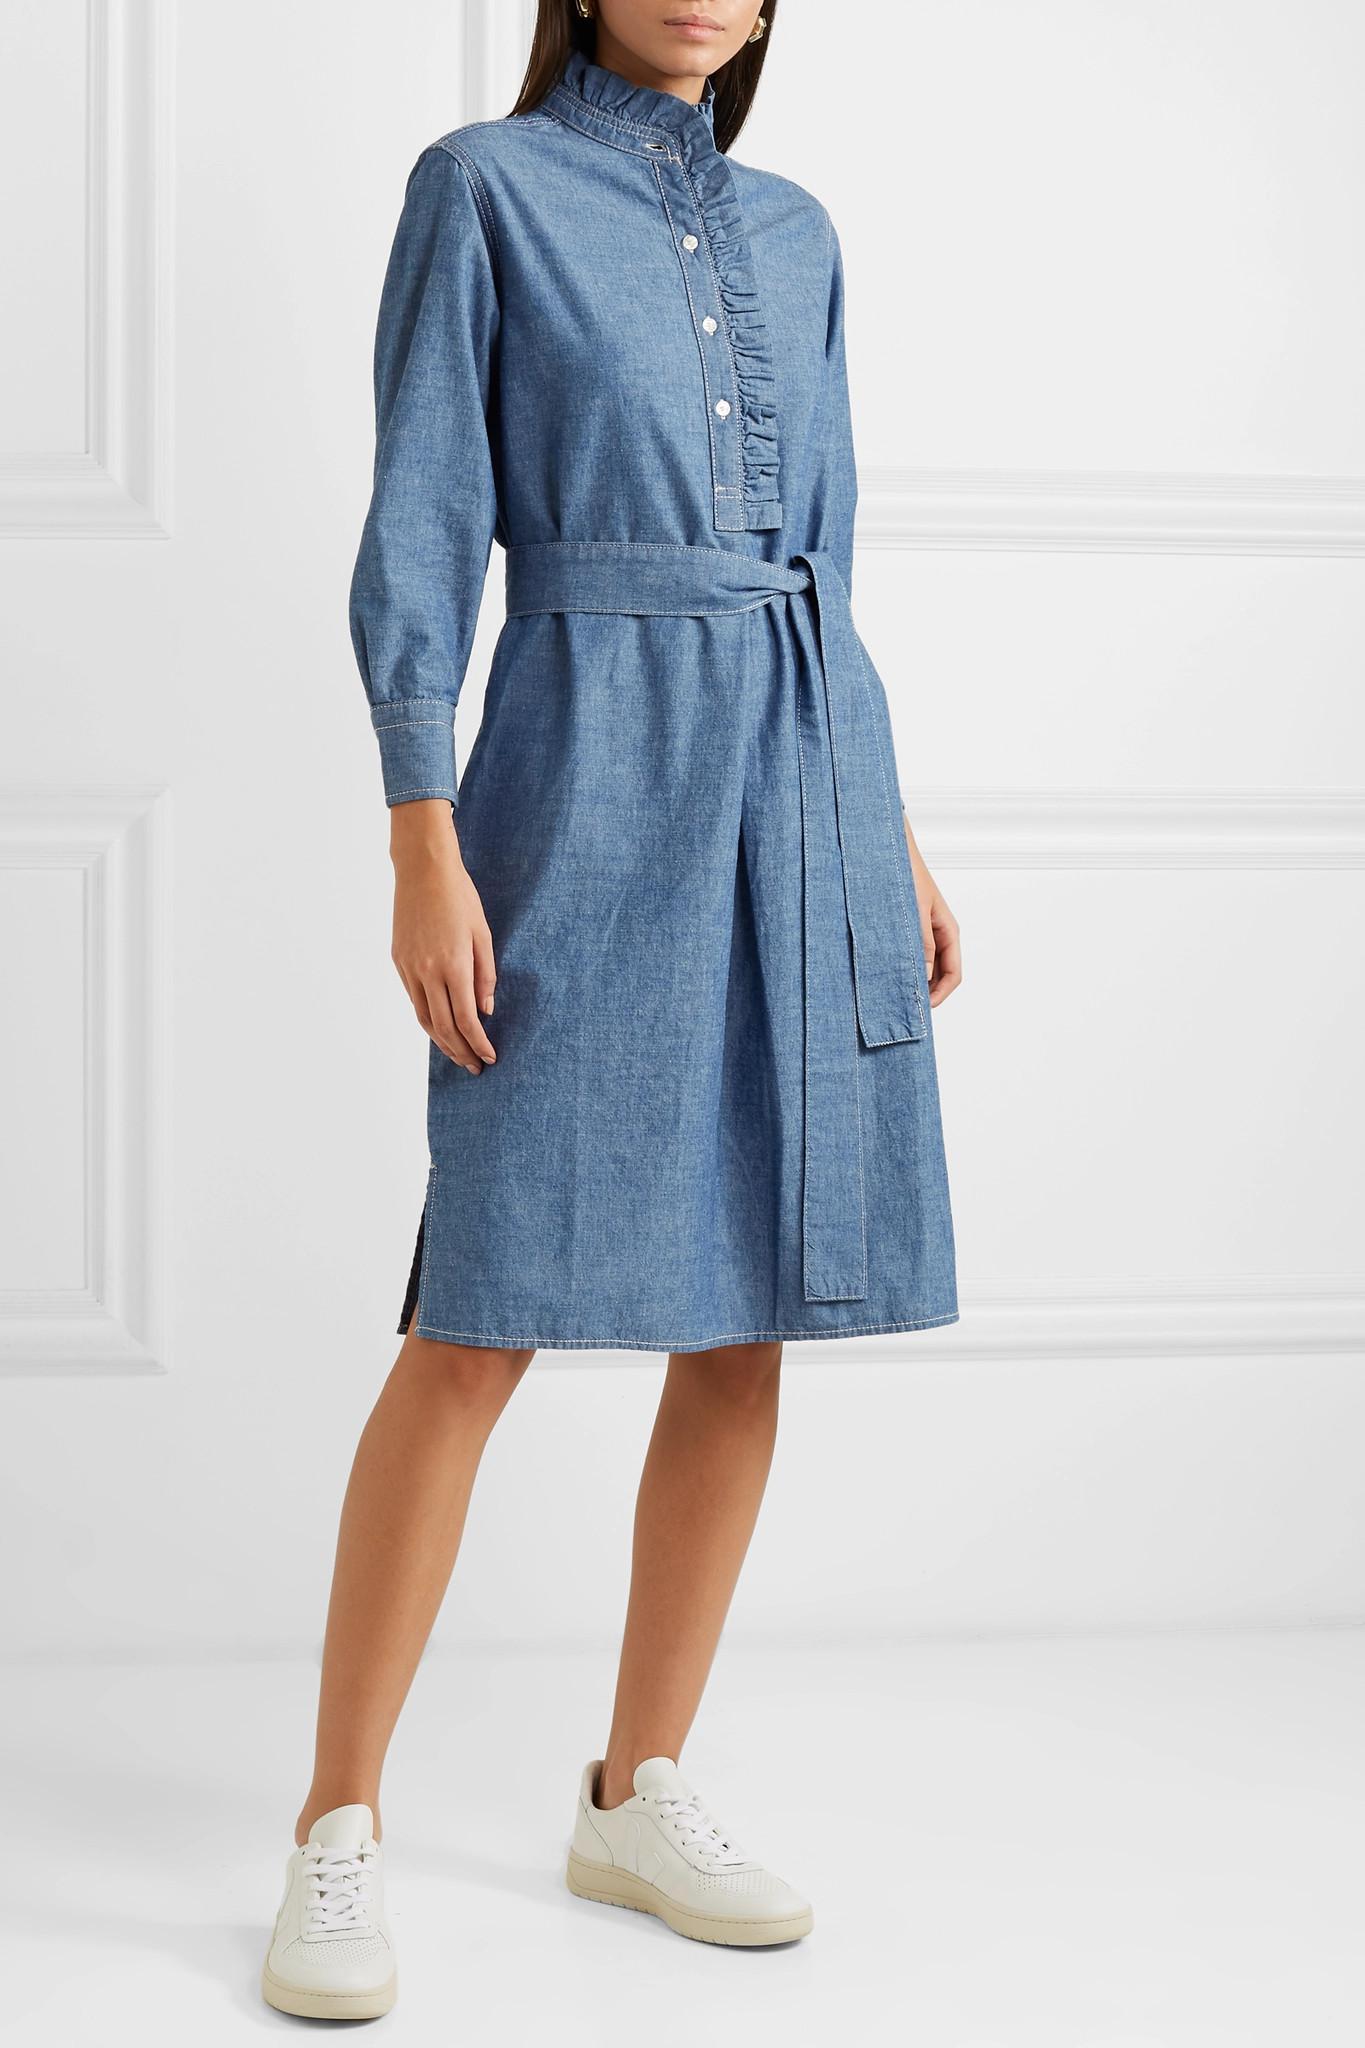 448b99056e Tory Burch - Blue Deneuve Belted Ruffle-trimmed Cotton-chambray Dress -  Lyst. View fullscreen